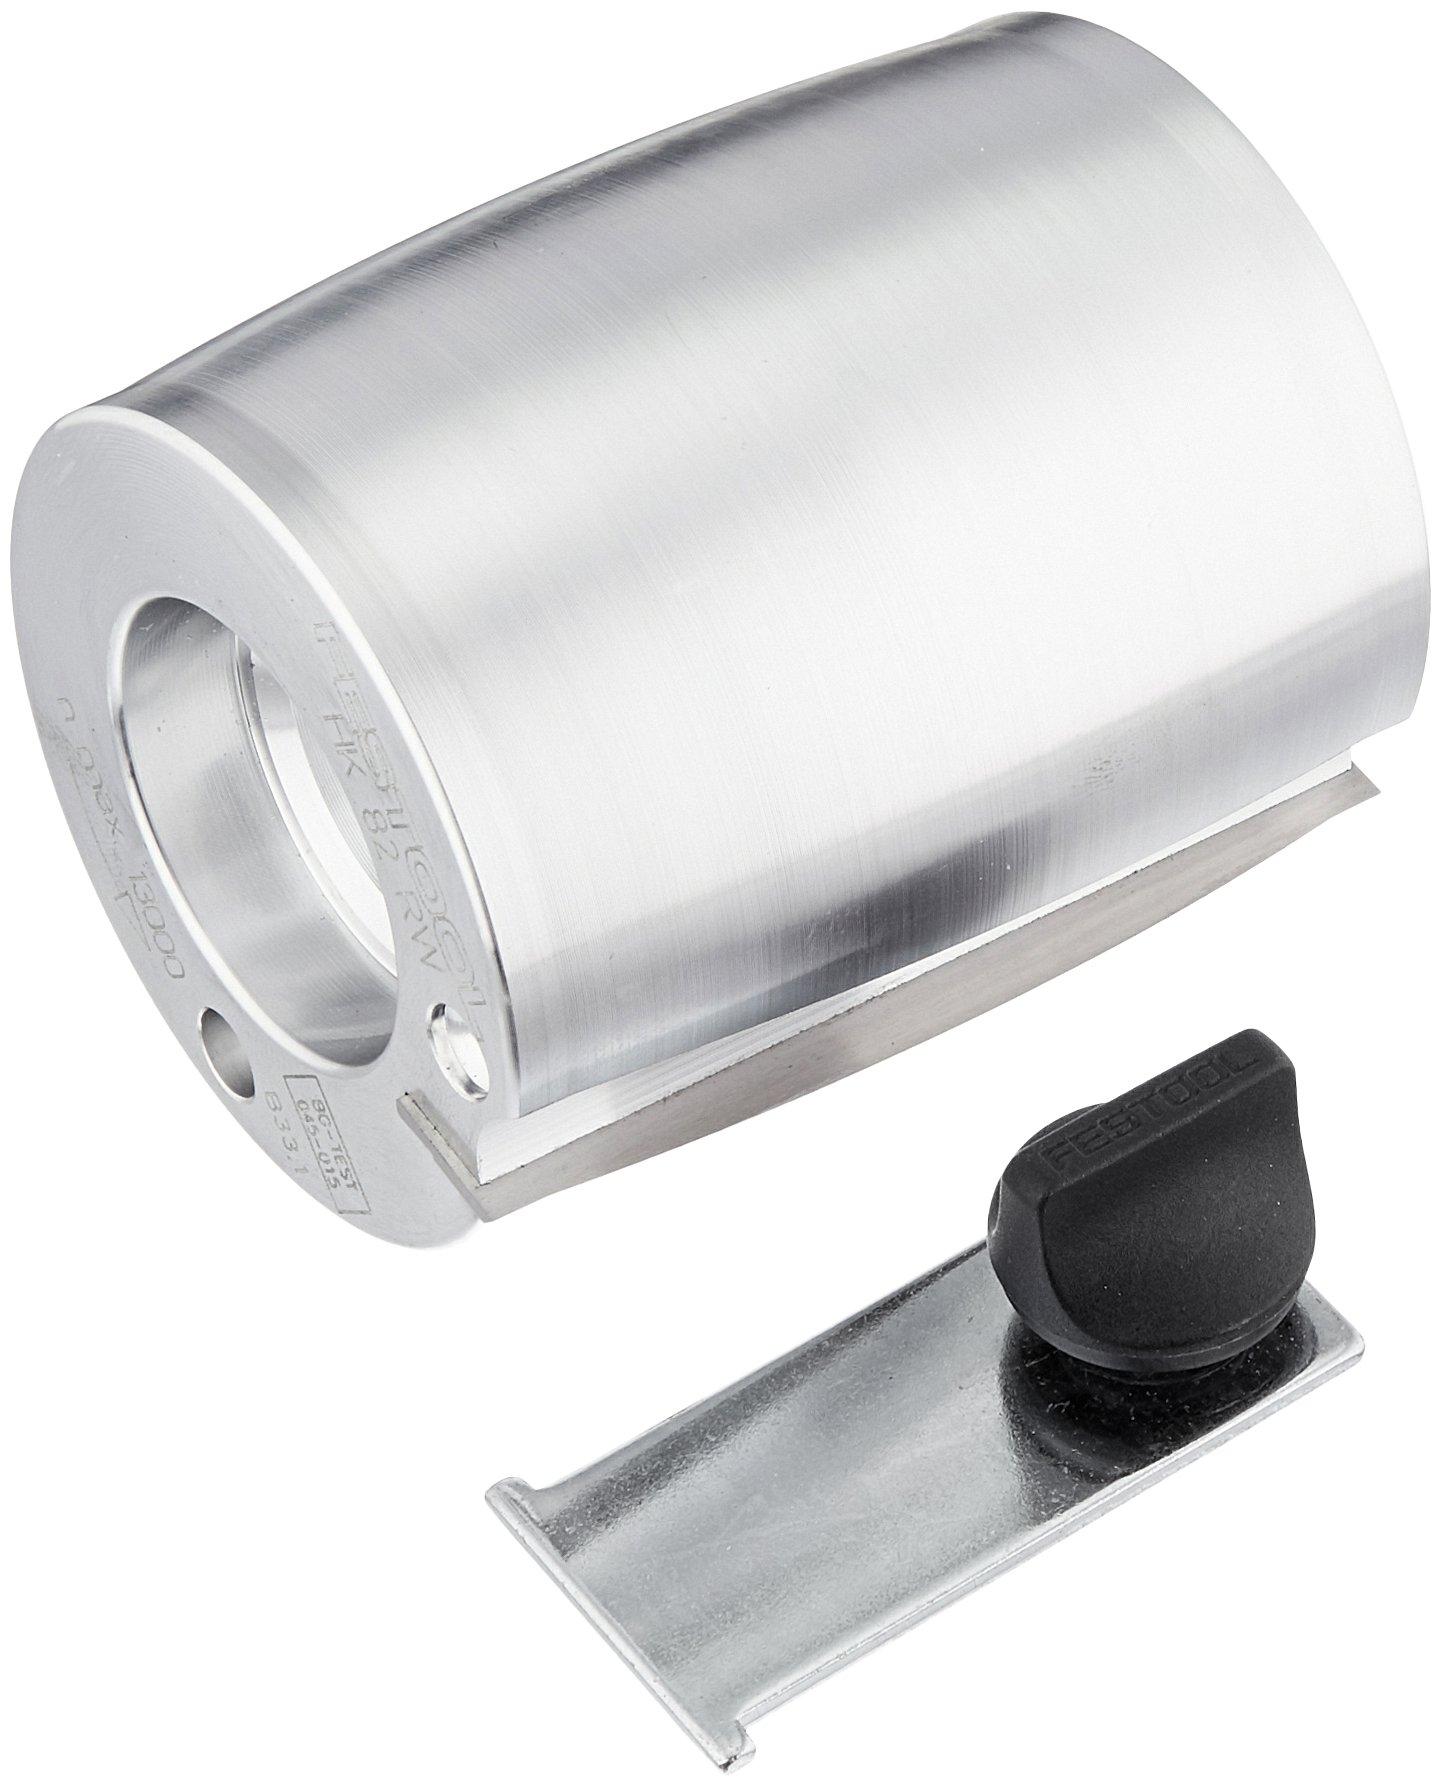 56556210 .621 Diameter Carbide Tipped Chucking Reamer